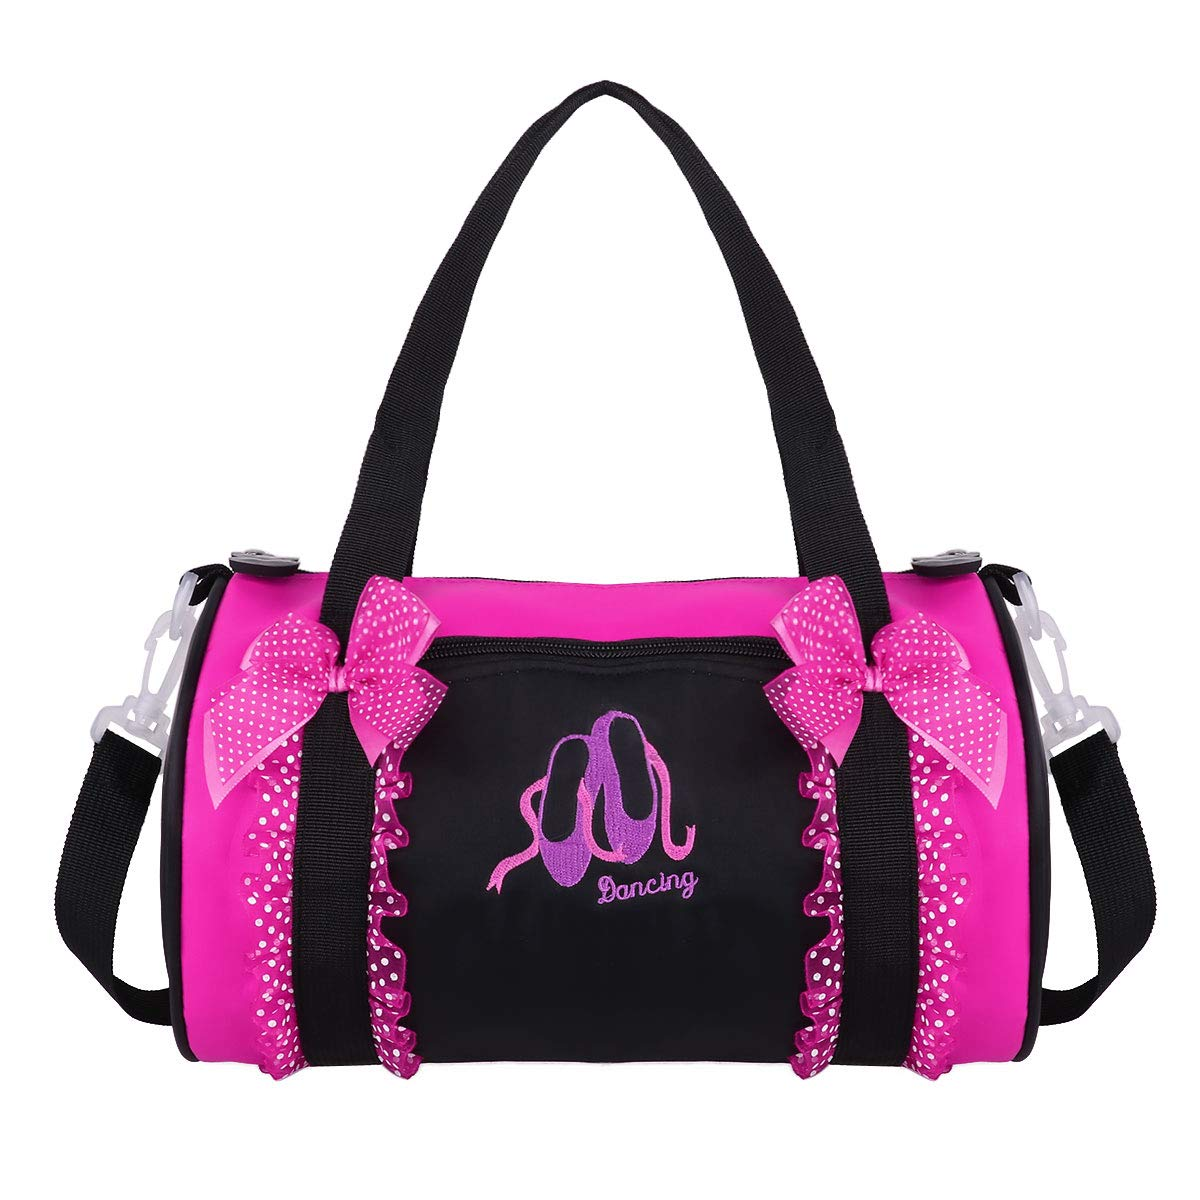 Amazon.com: iEFiEL Girls Lovely Ruffle Dancing Bag Ballet ...